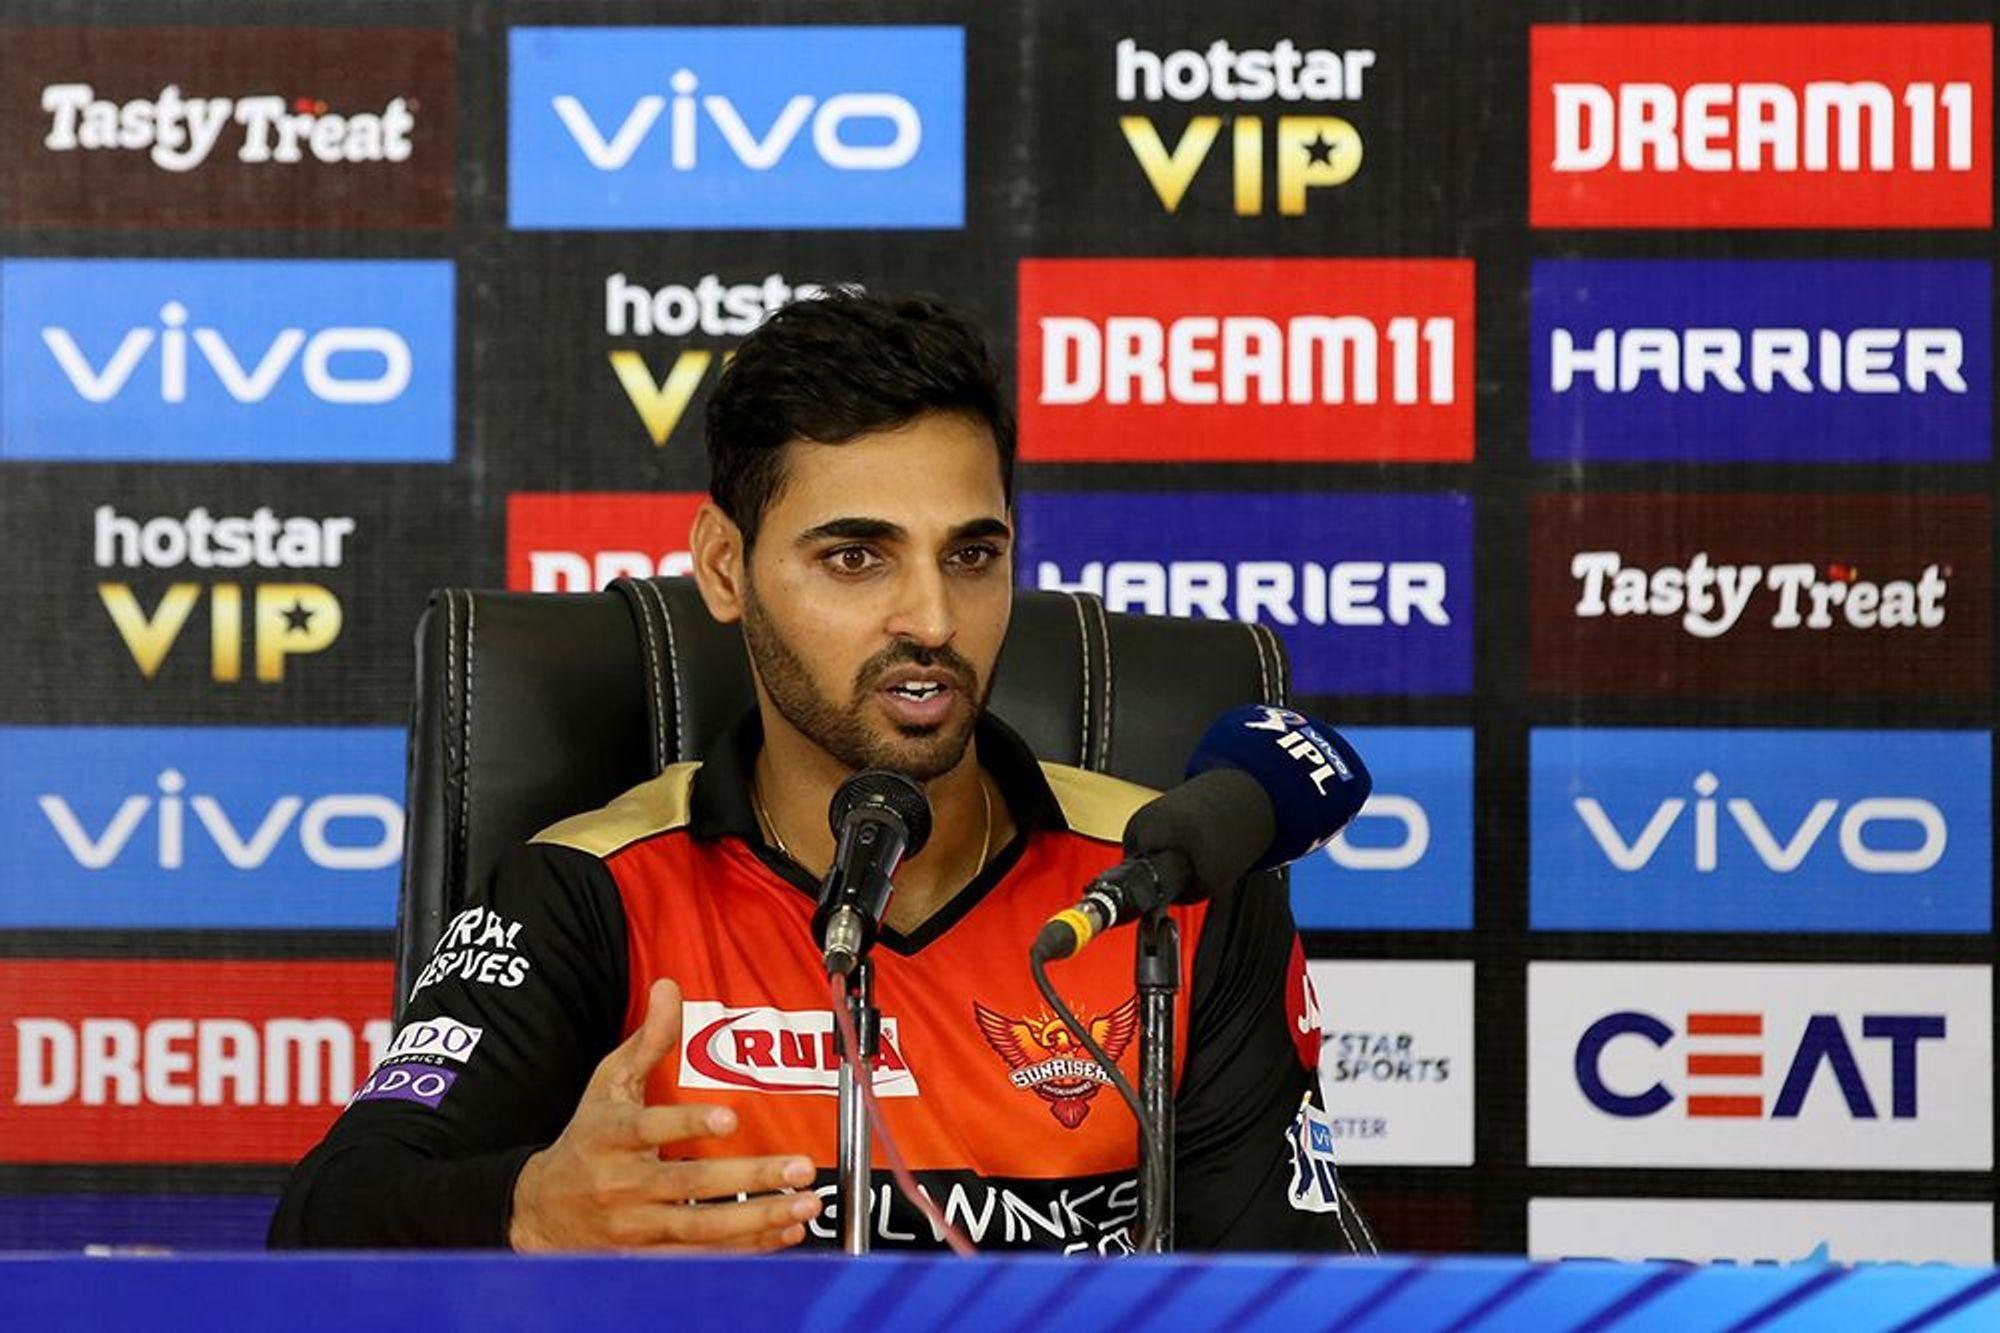 भुवनेश्वर कुमार के सामने बेबस दिखा आईपीएल का सबसे विस्फोटक बल्लेबाज आंद्रे रसेल, अब भुवी ने खोली कमजोरी 5